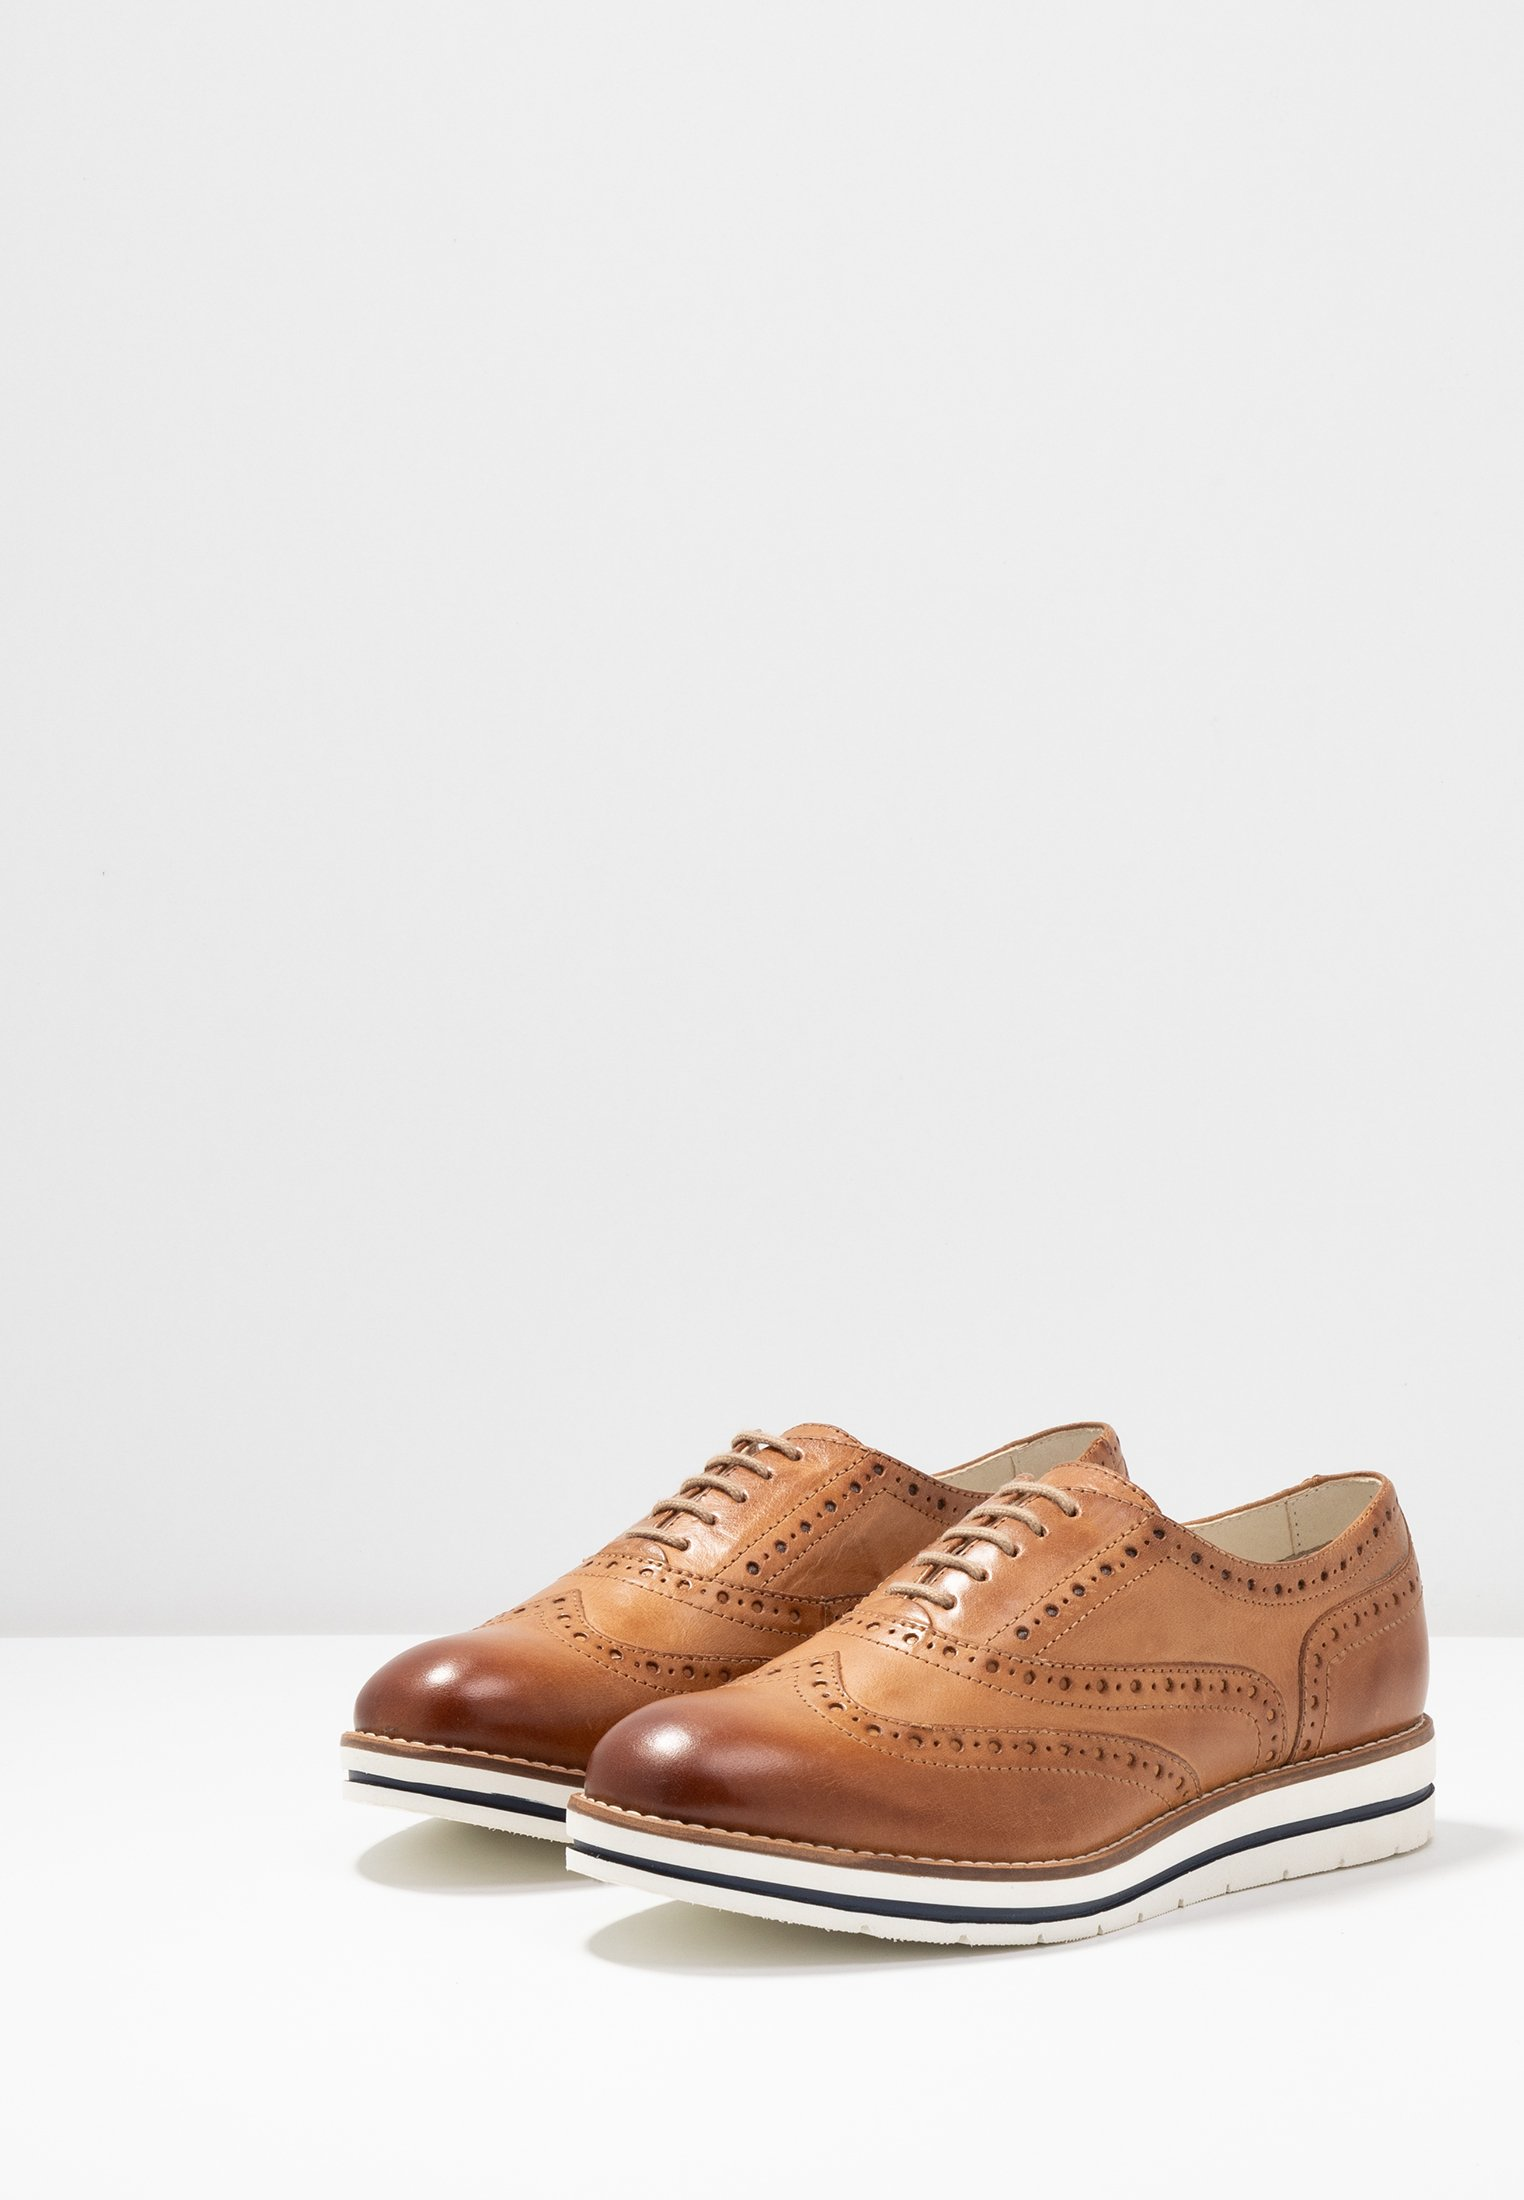 Anna Field Leather Flat Shoes - Sporty Snøresko Cognac